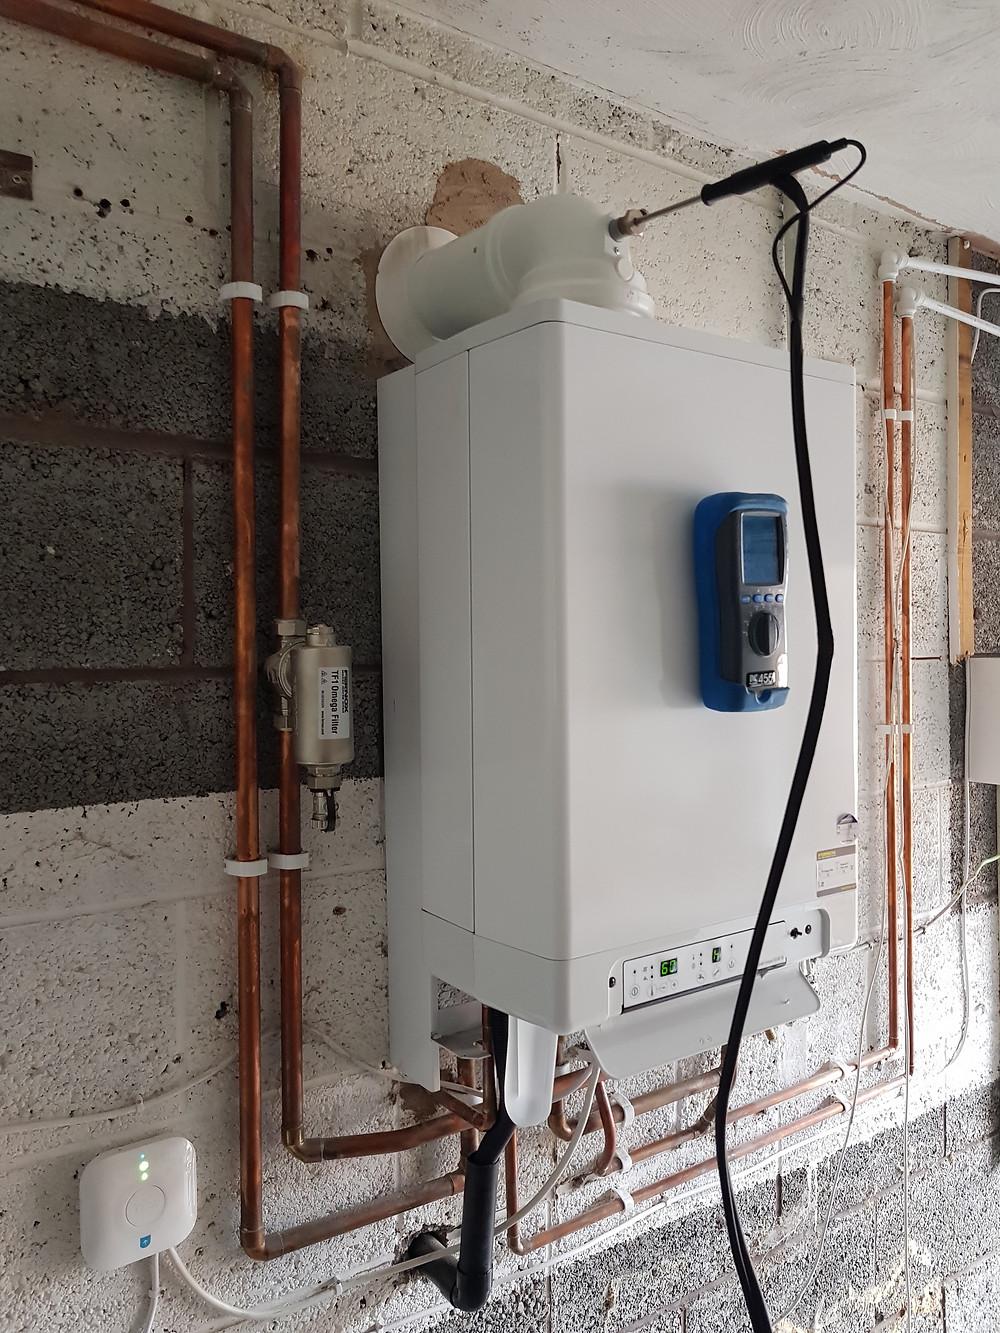 Intergas boiler installation by GO2 Heating Solutions Ltd